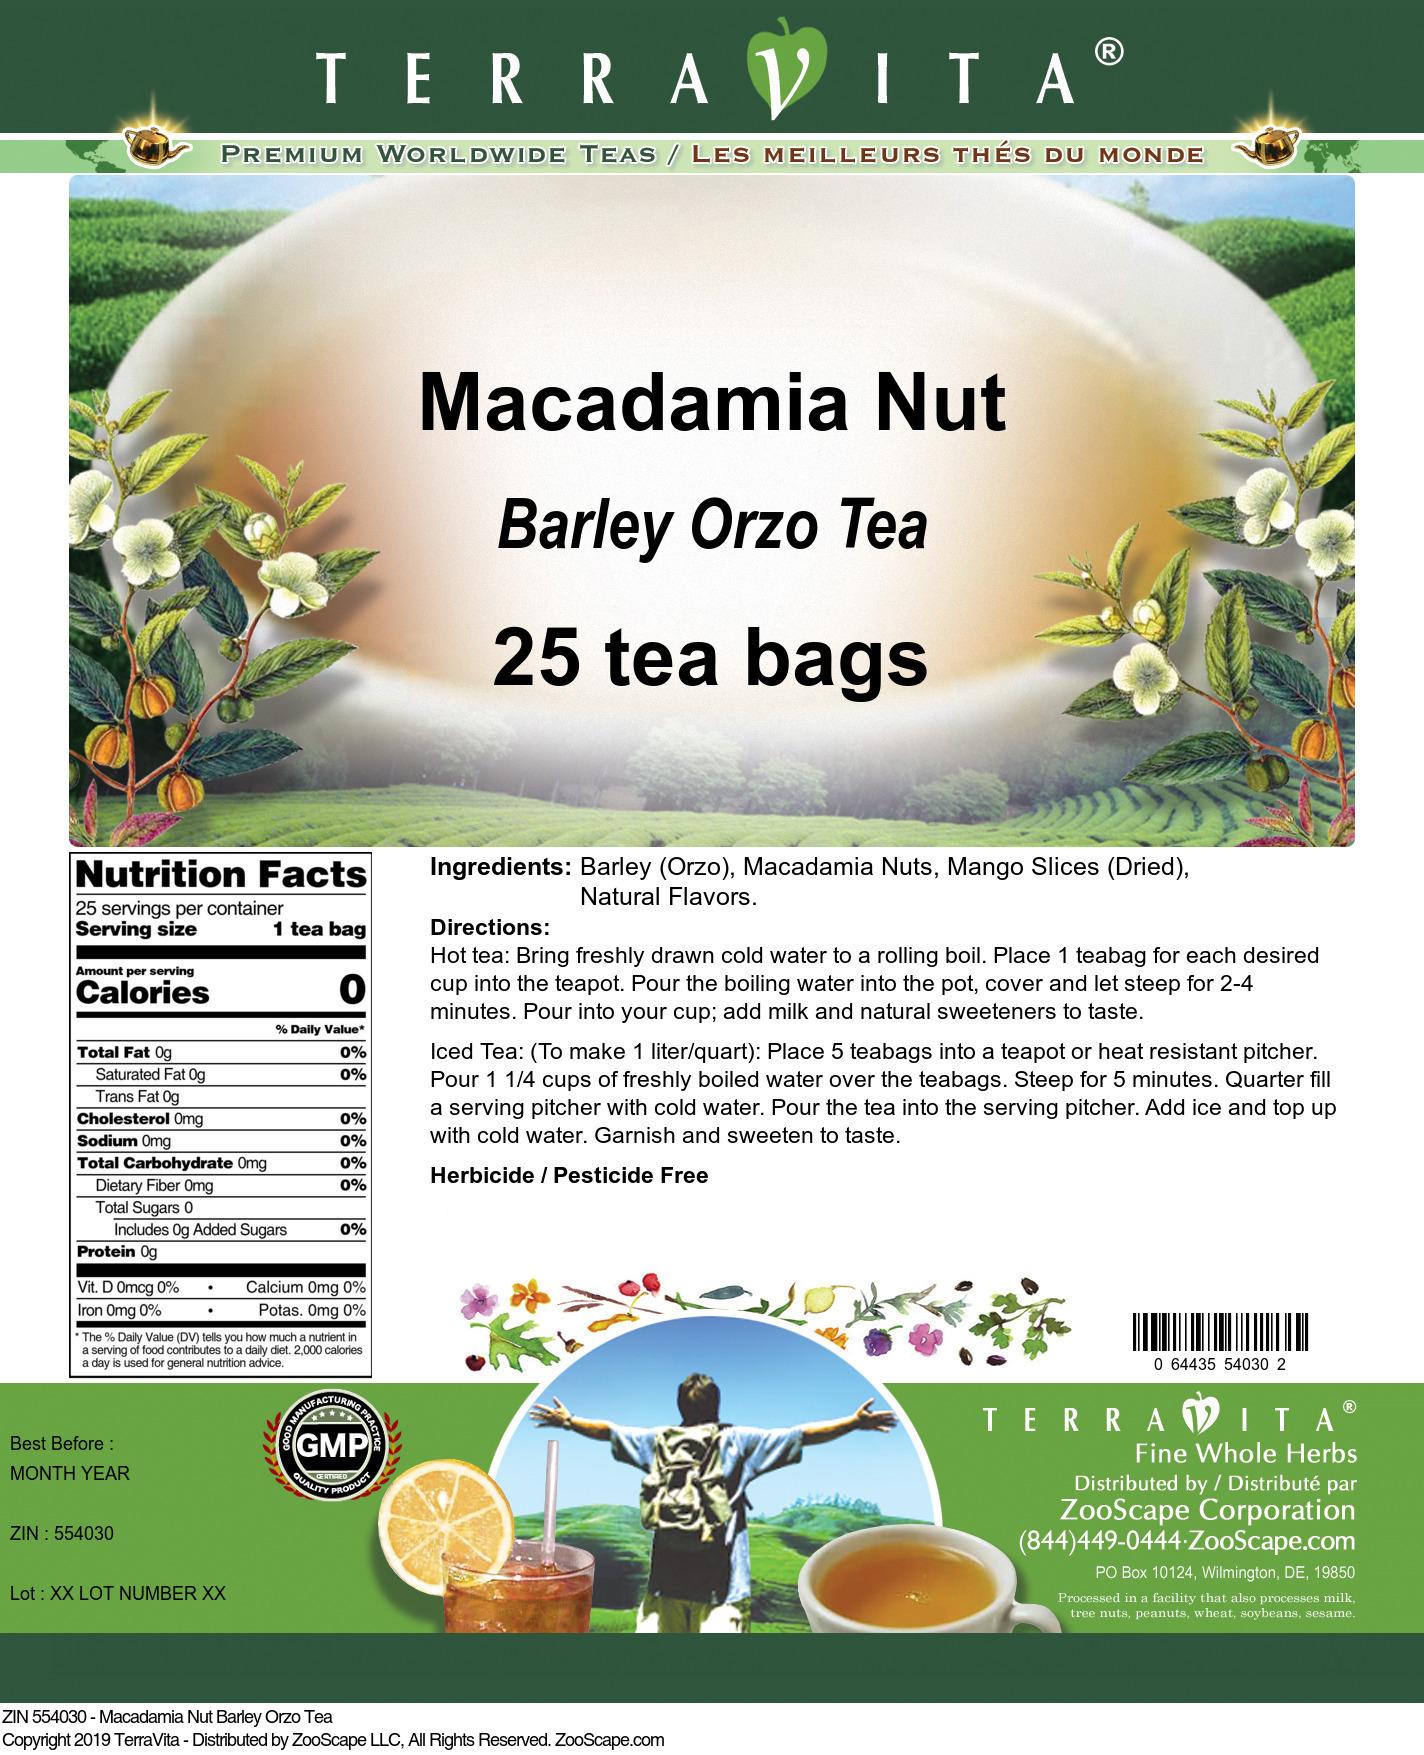 Macadamia Nut Barley Orzo